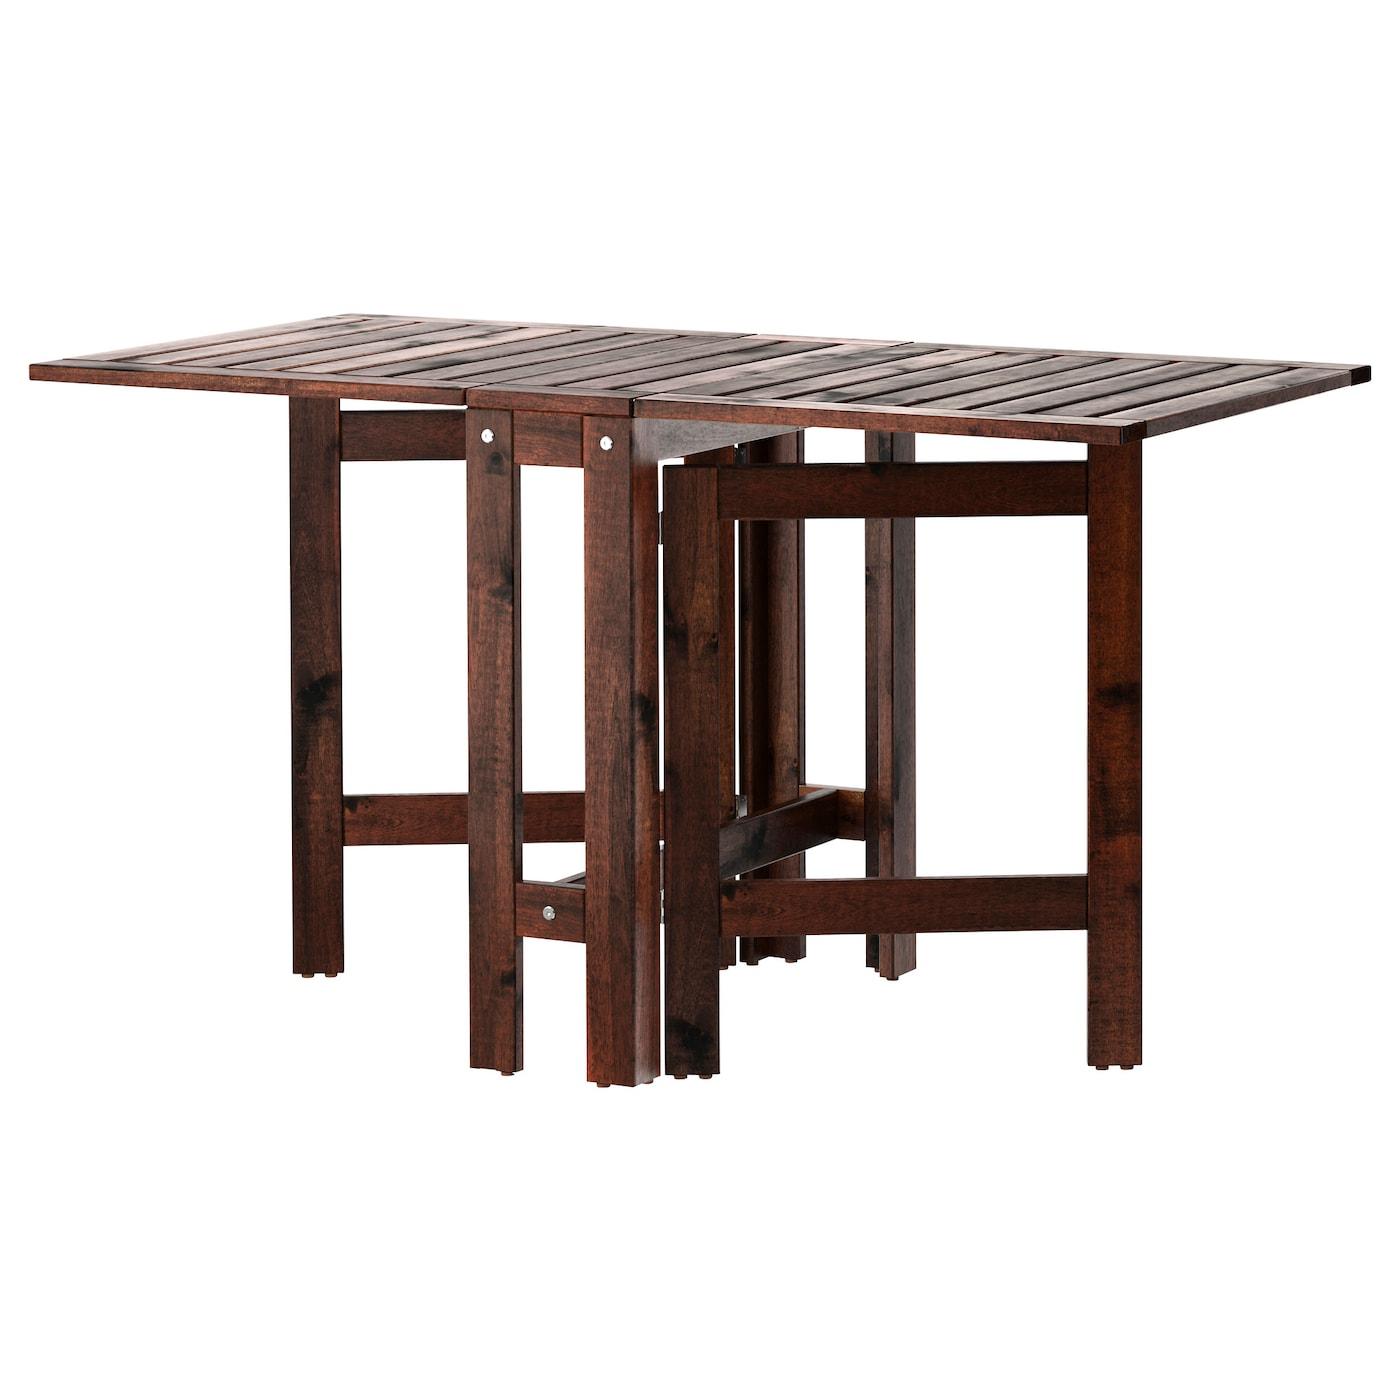 ÄpplarÖ table pliante, extérieur teinté brun 20/77/133 x 62 cm - ikea